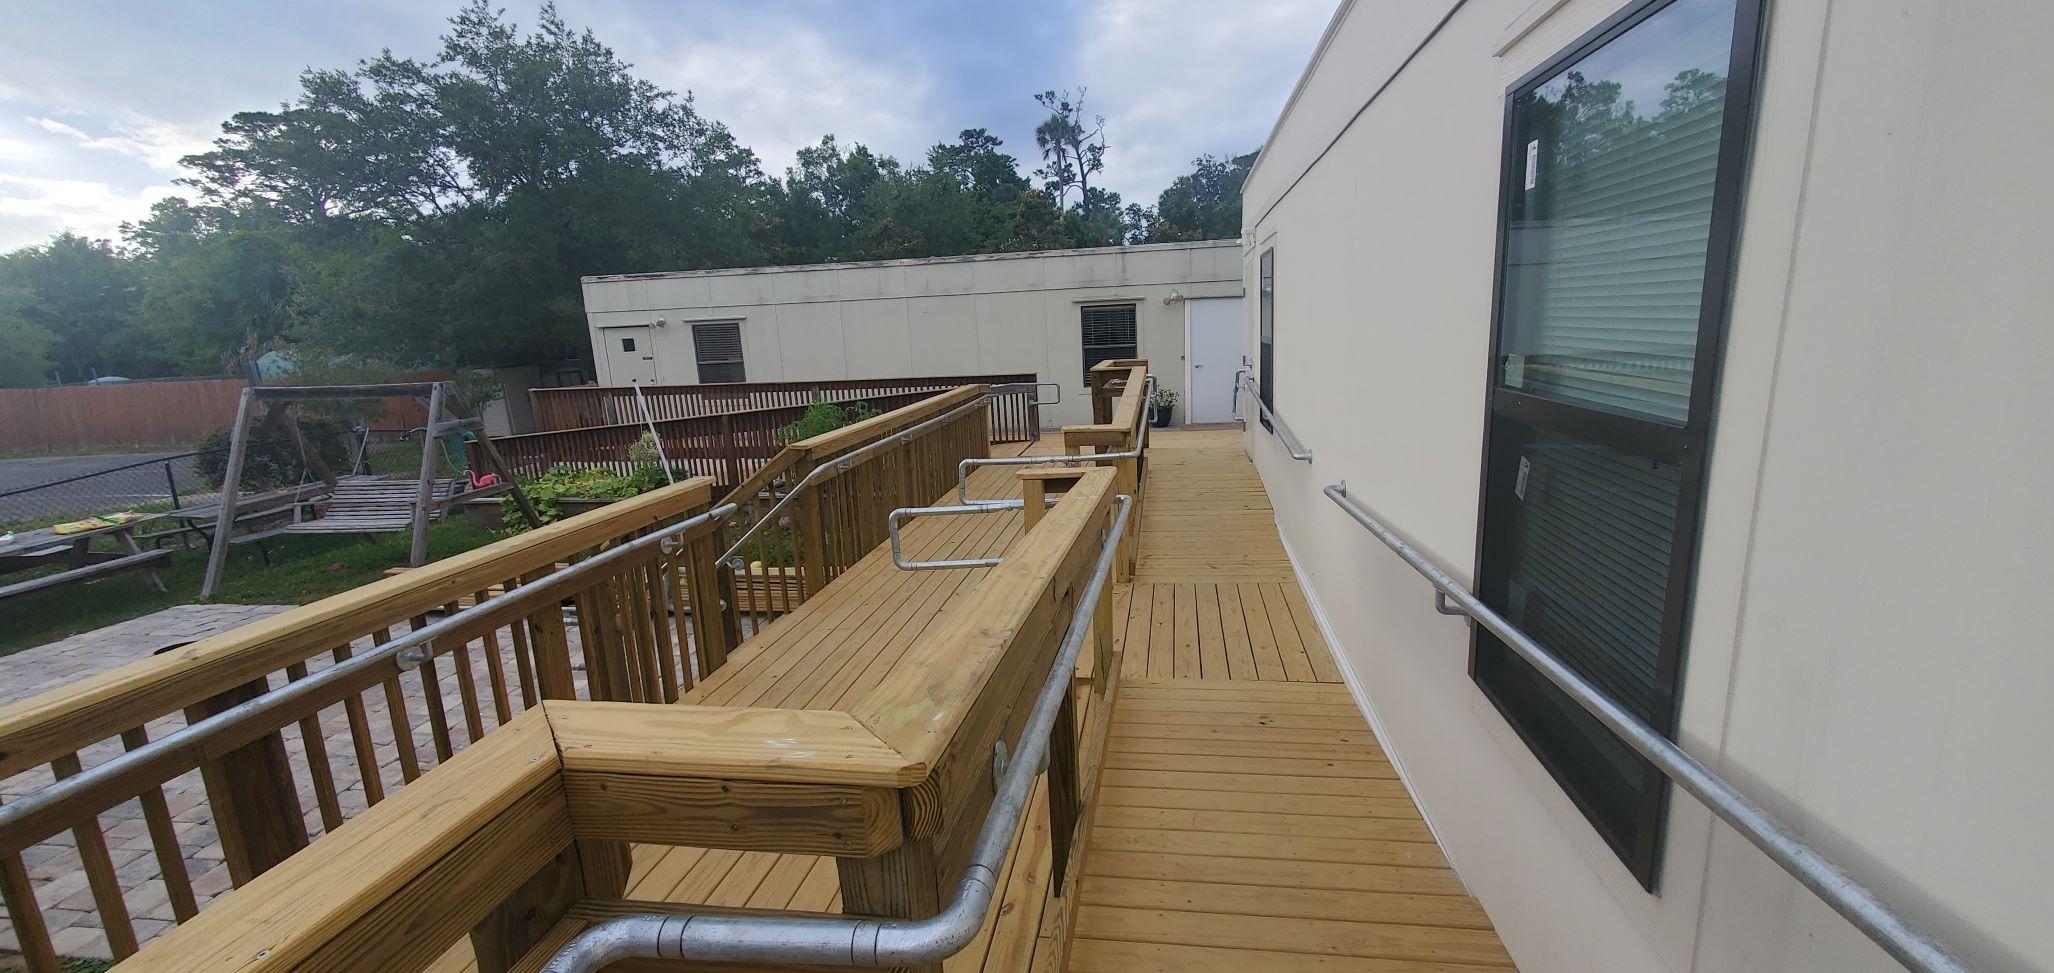 Retrofitted Wooden Guardrail ADA Compliant